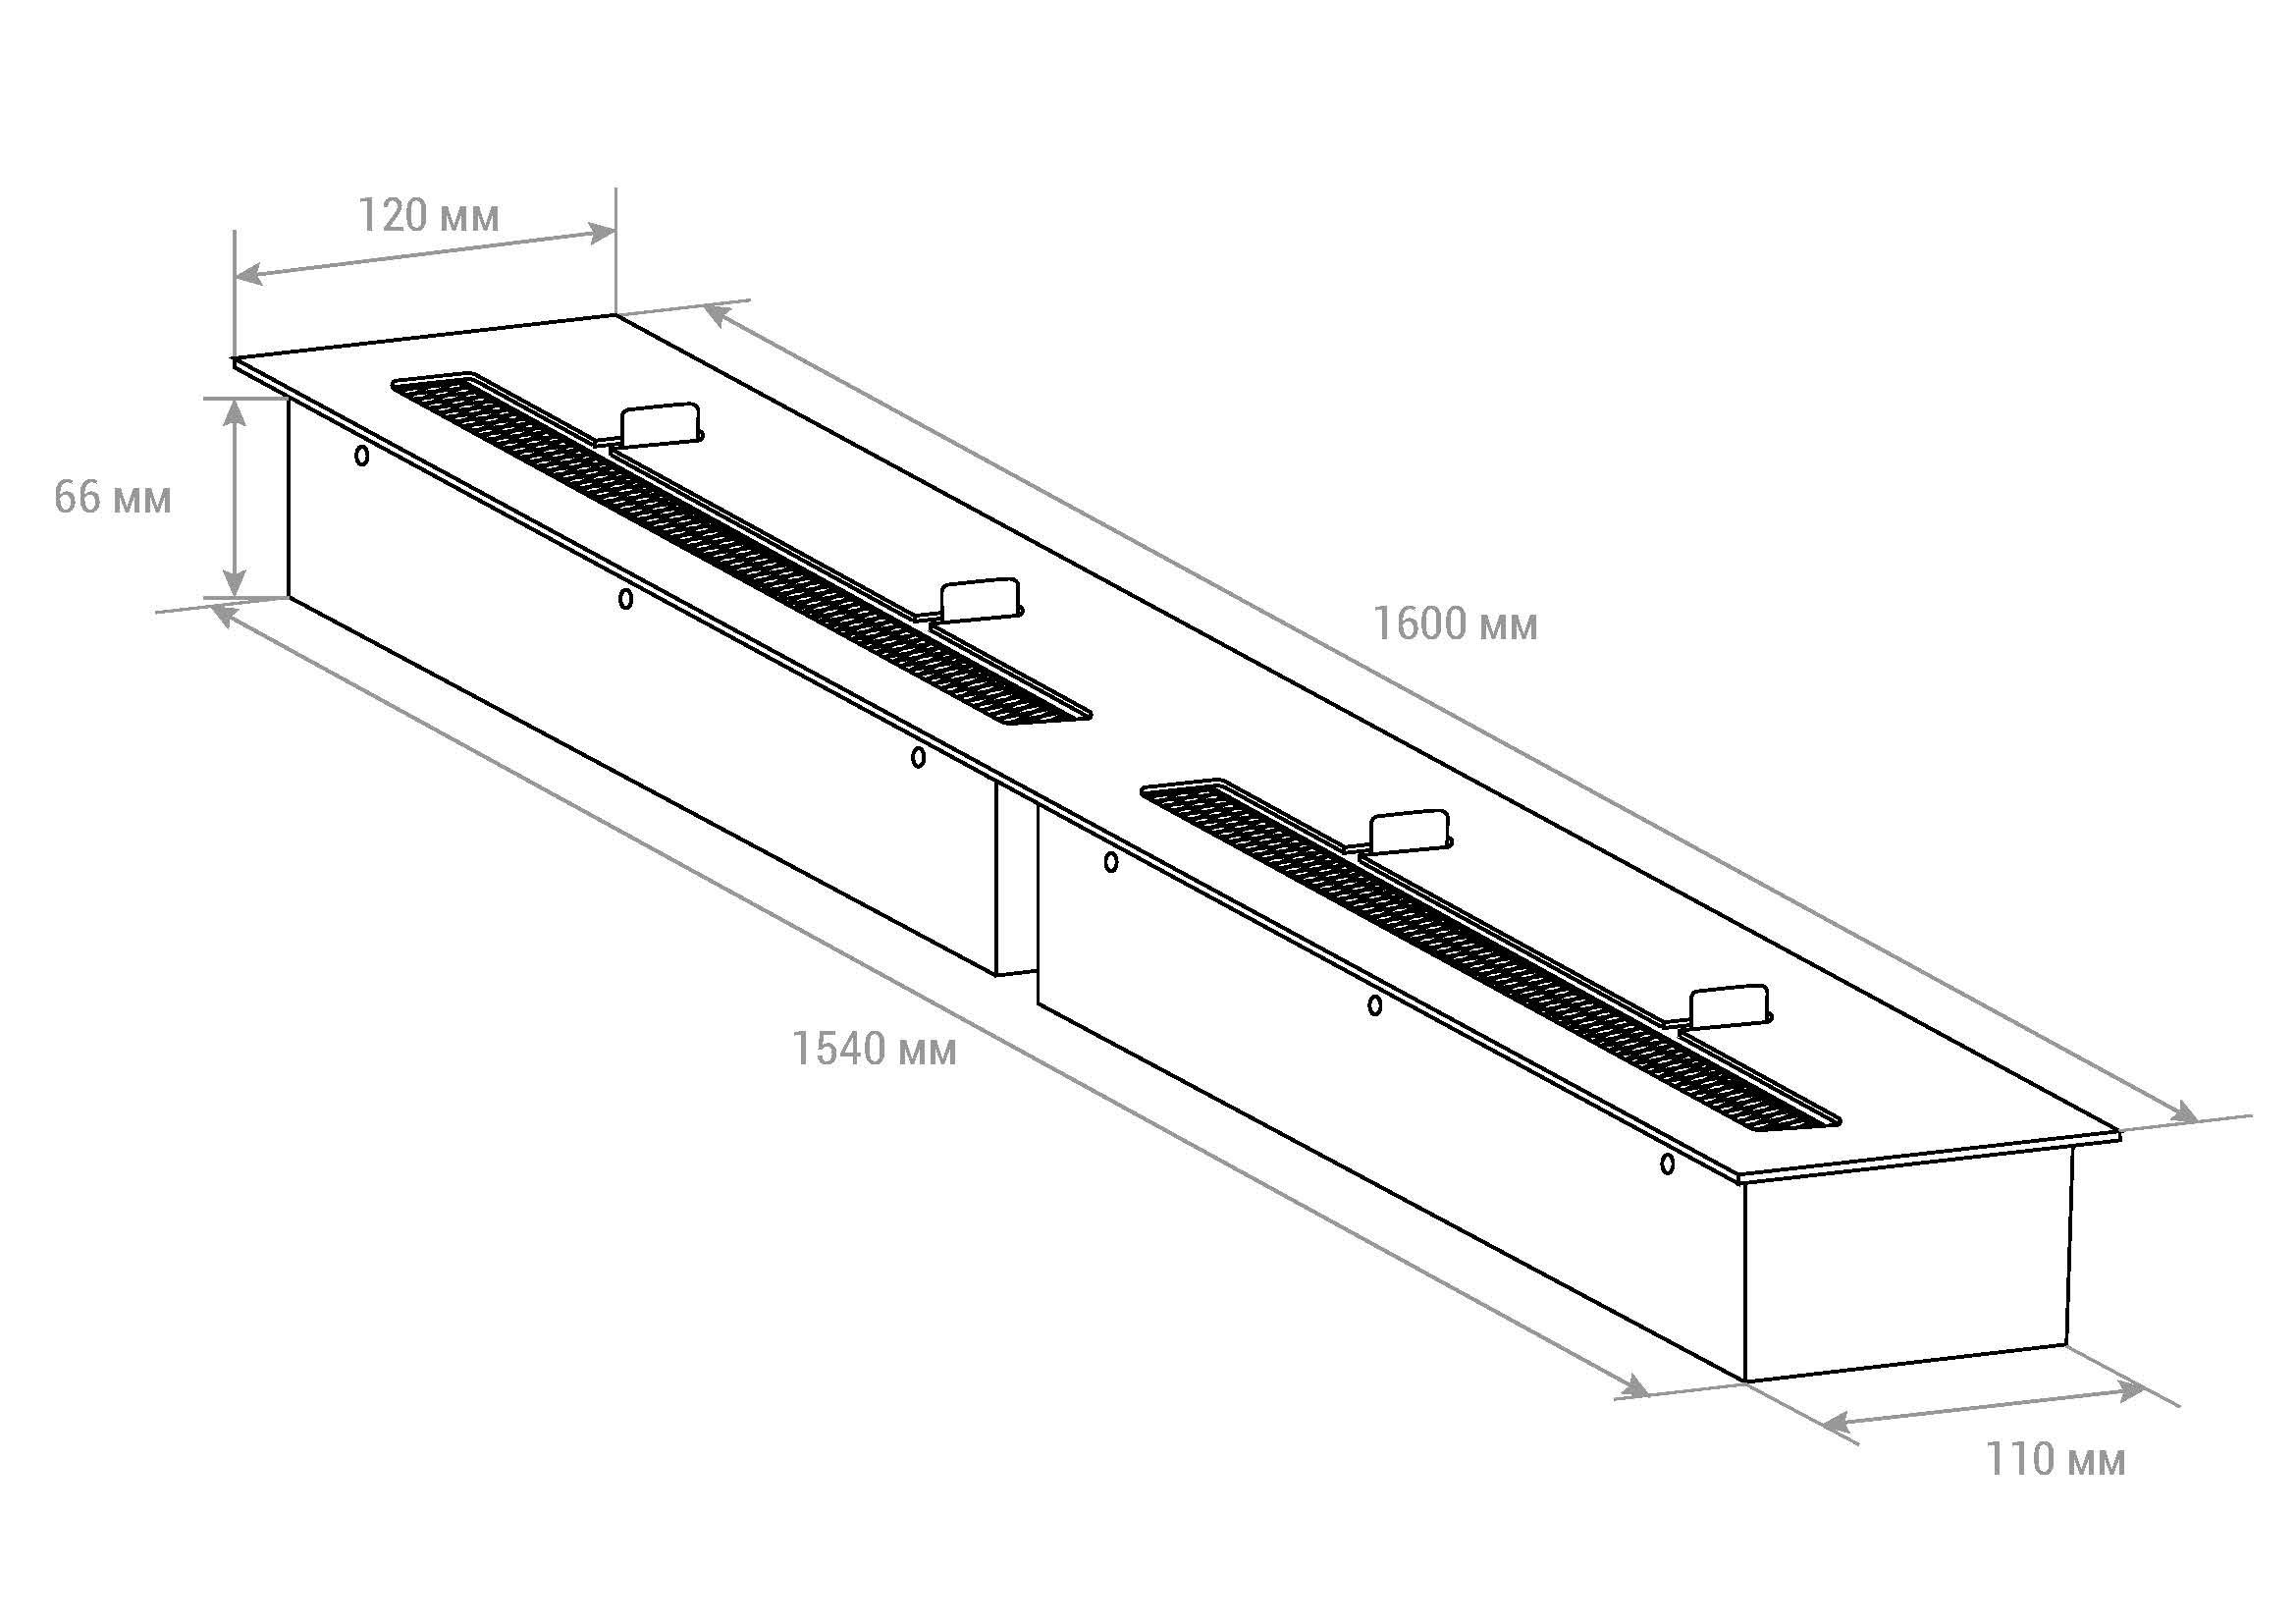 Схема топливного блока Lux Fire 1600 M